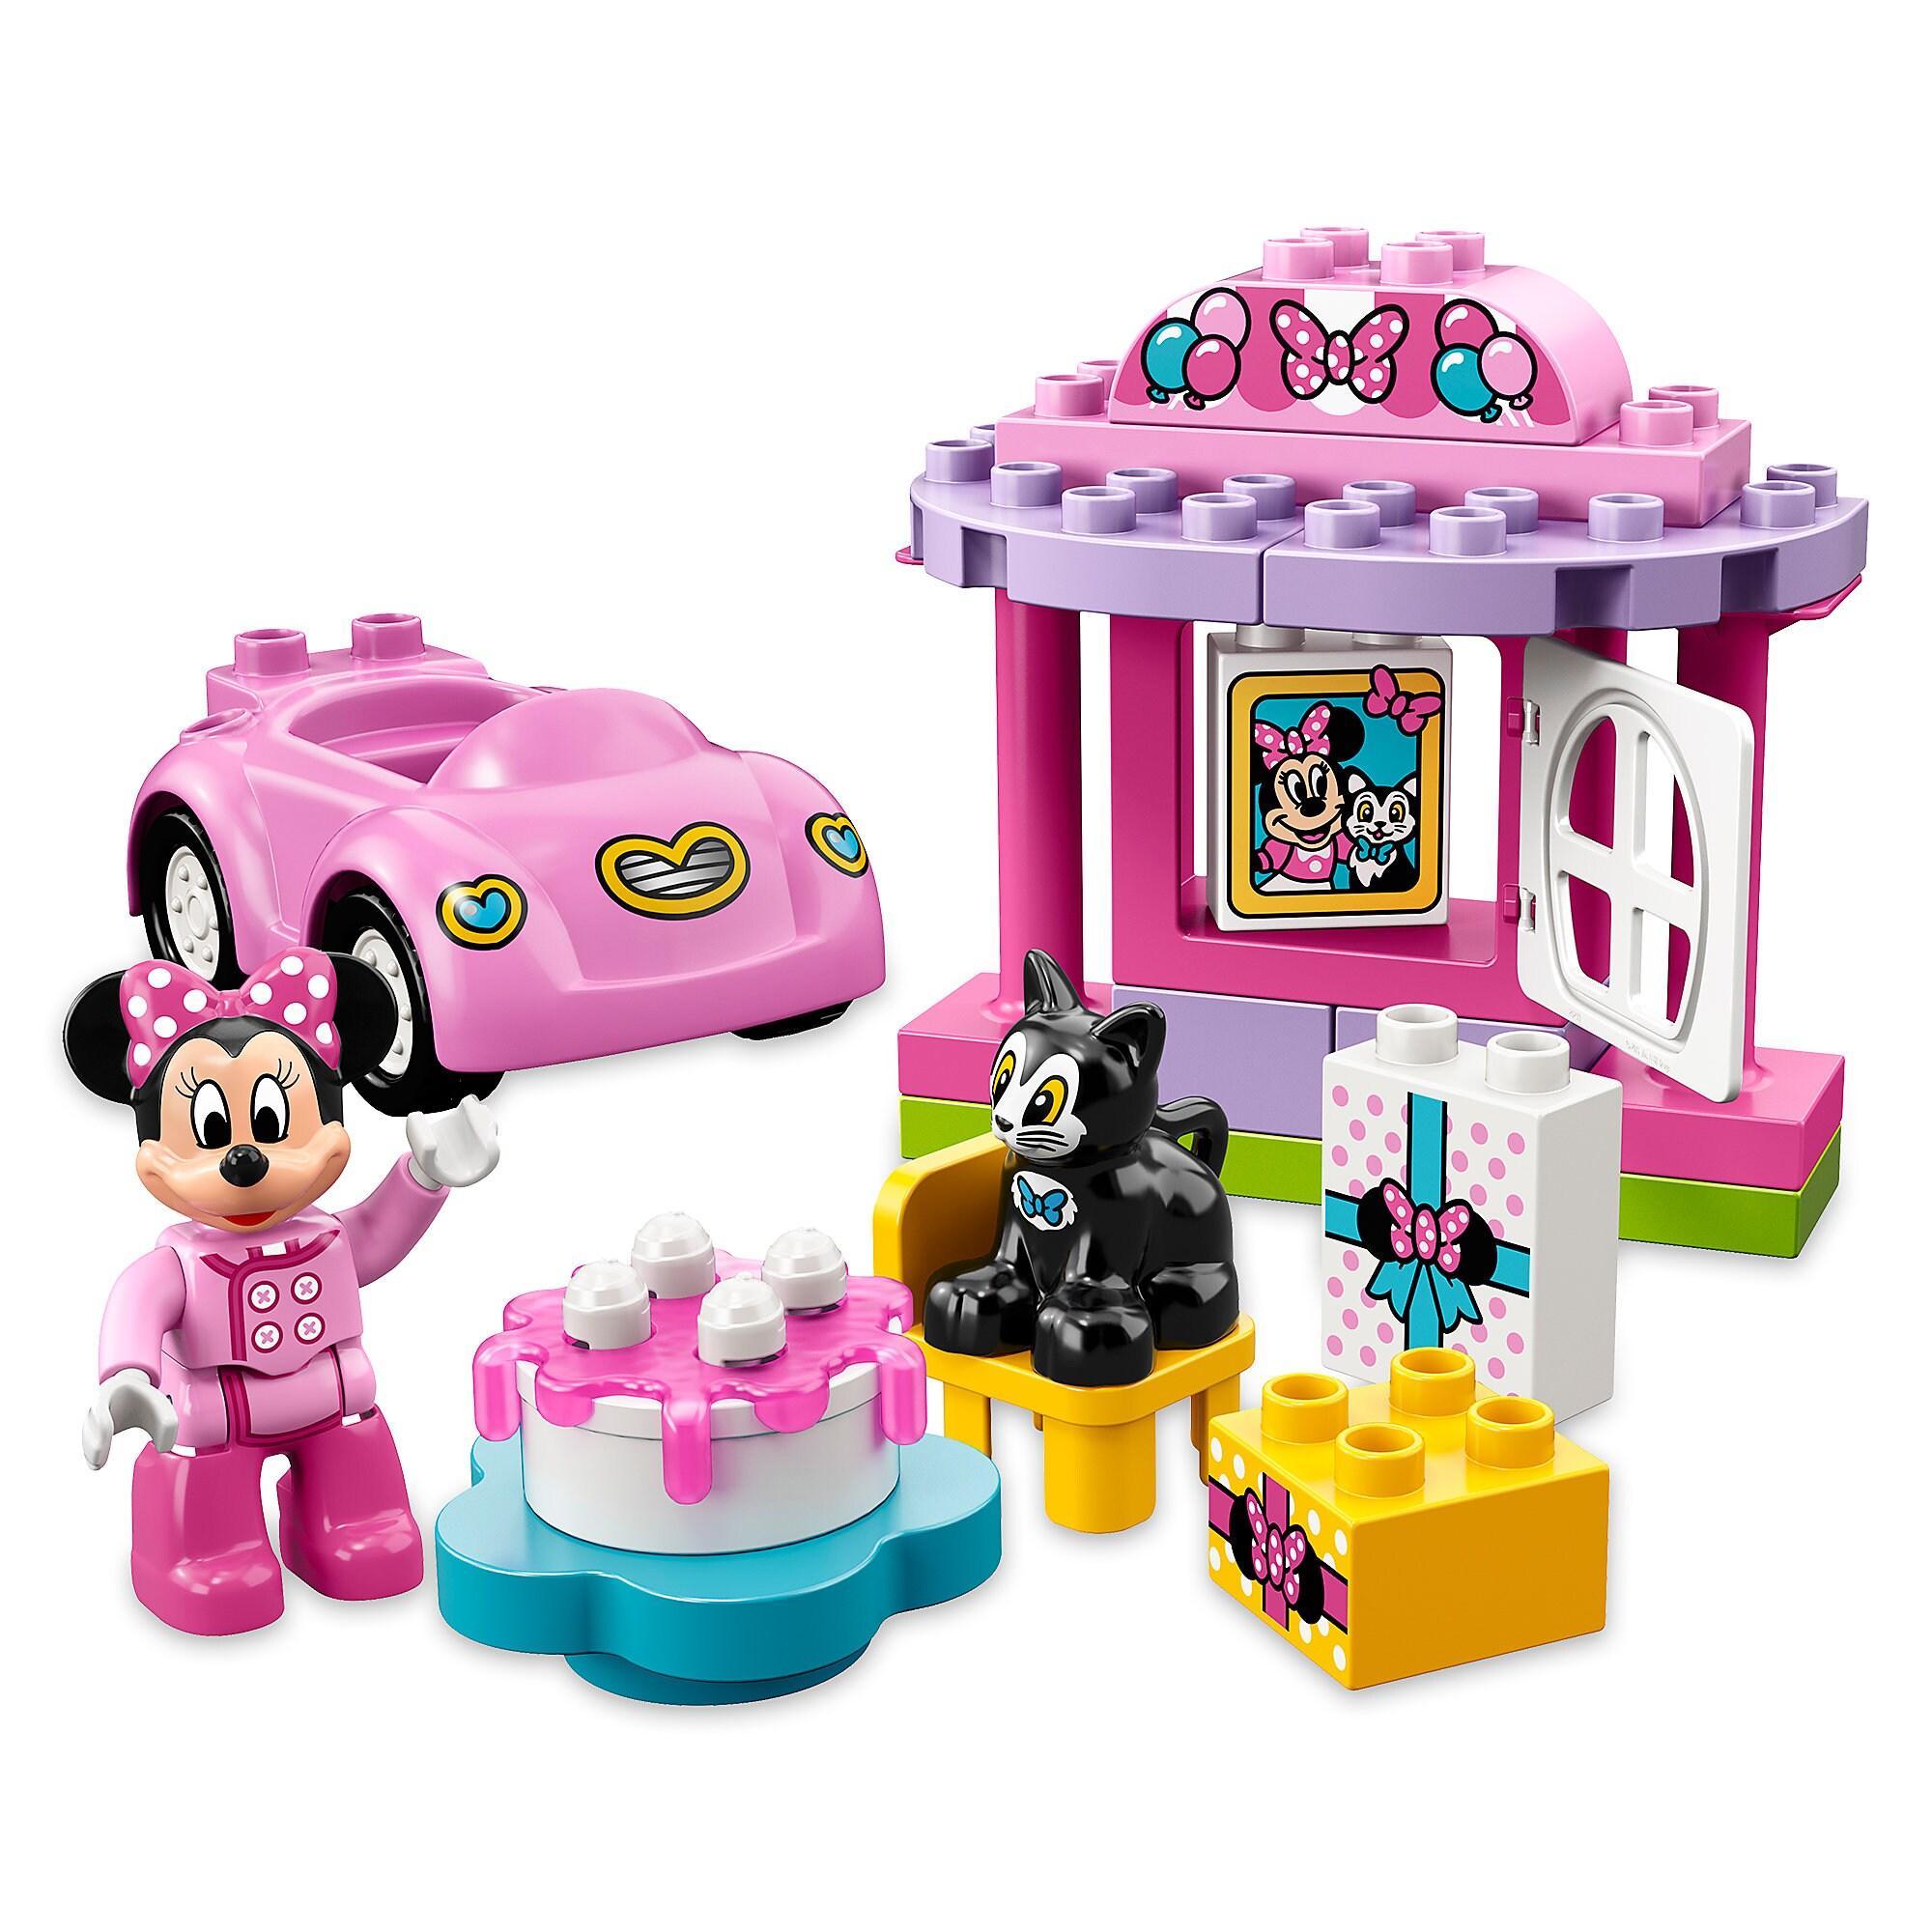 Minnie's Birthday Party Duplo Playset by LEGO